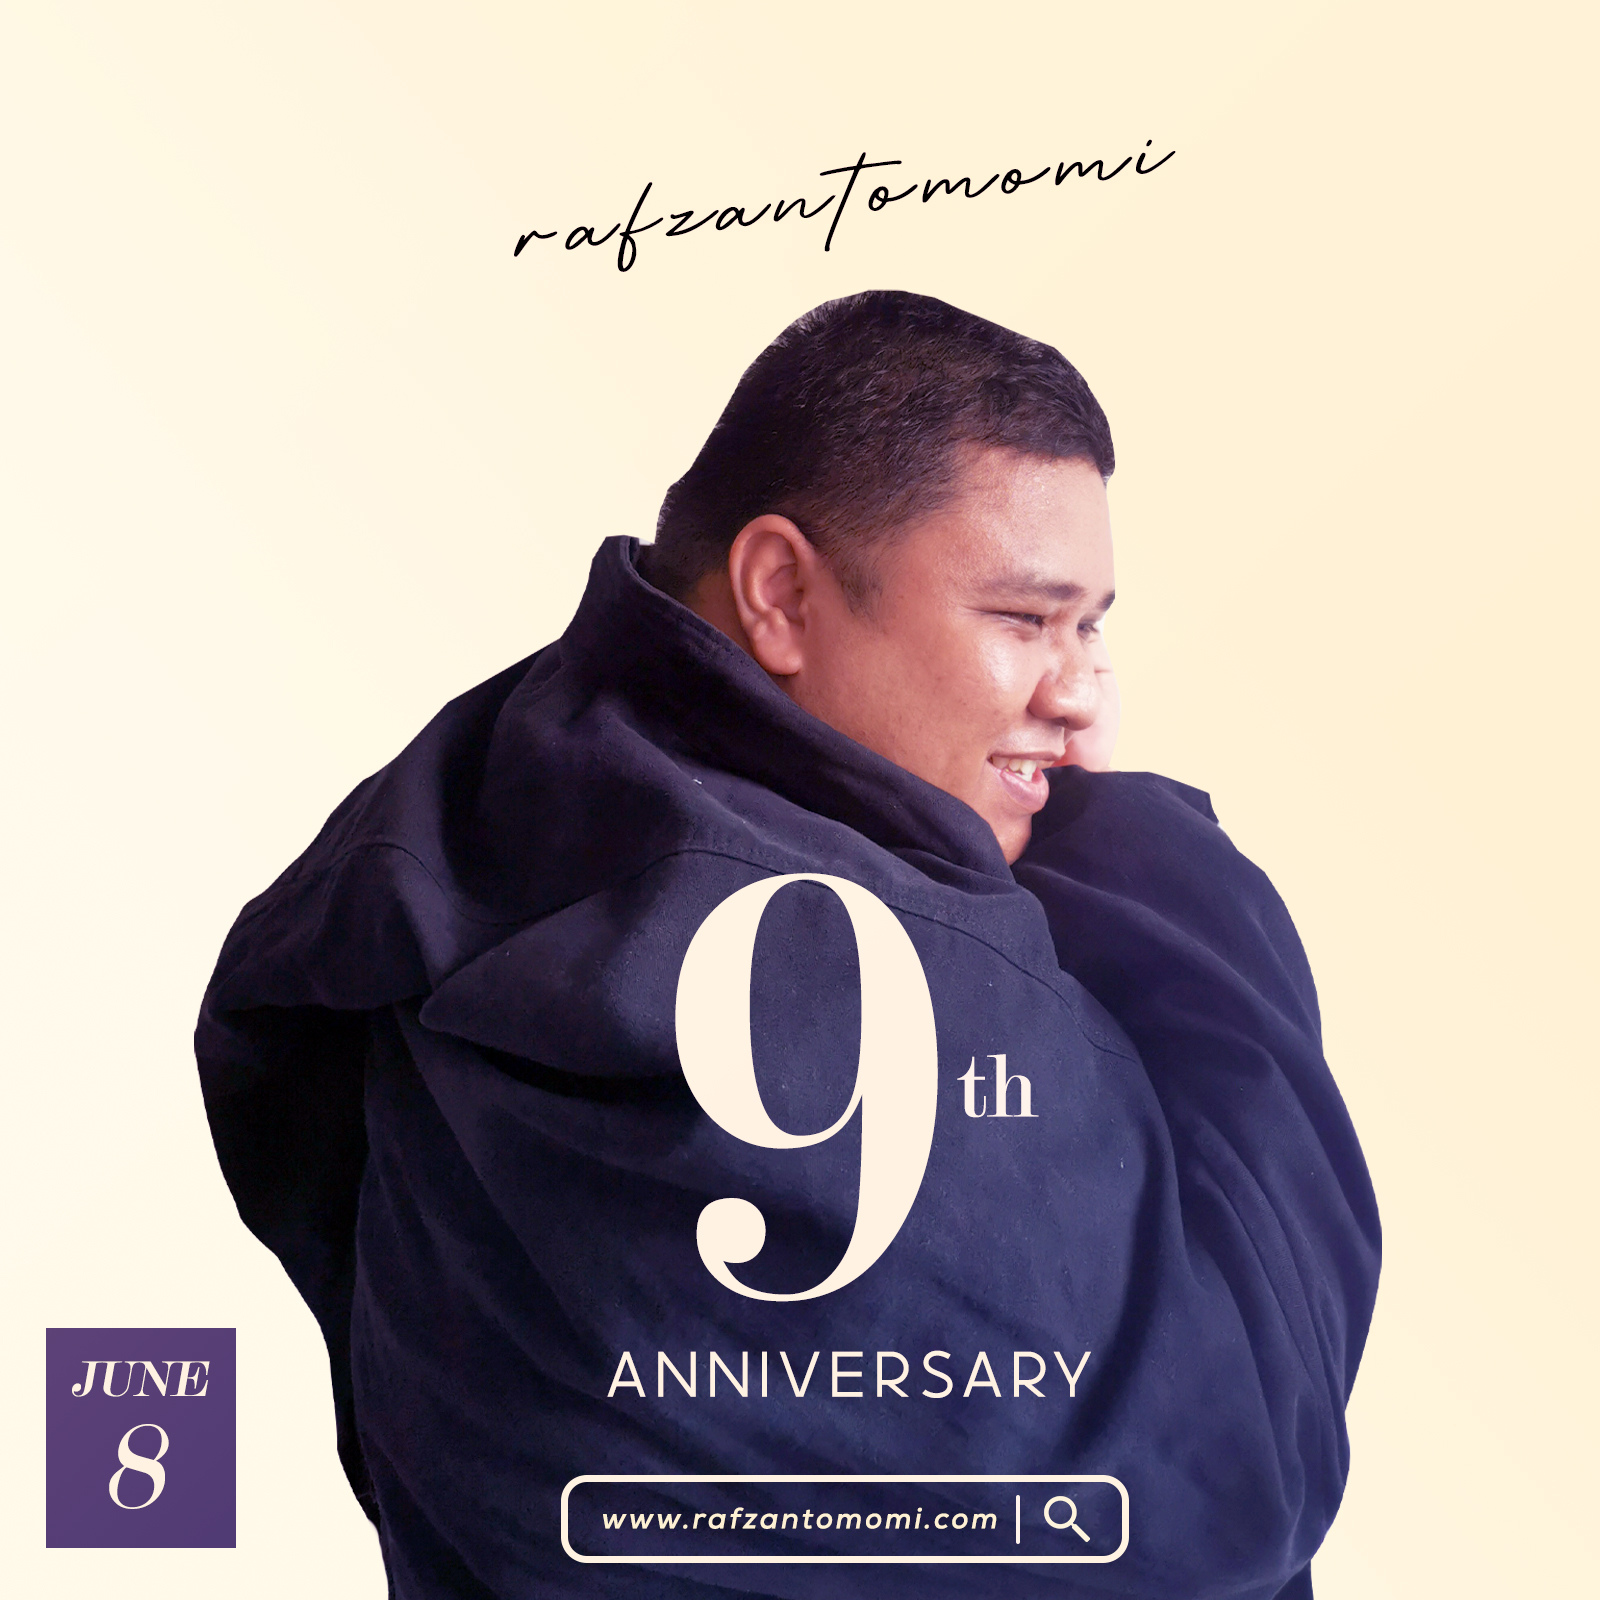 Happy 9th Anniversary, @rafzantomomi !